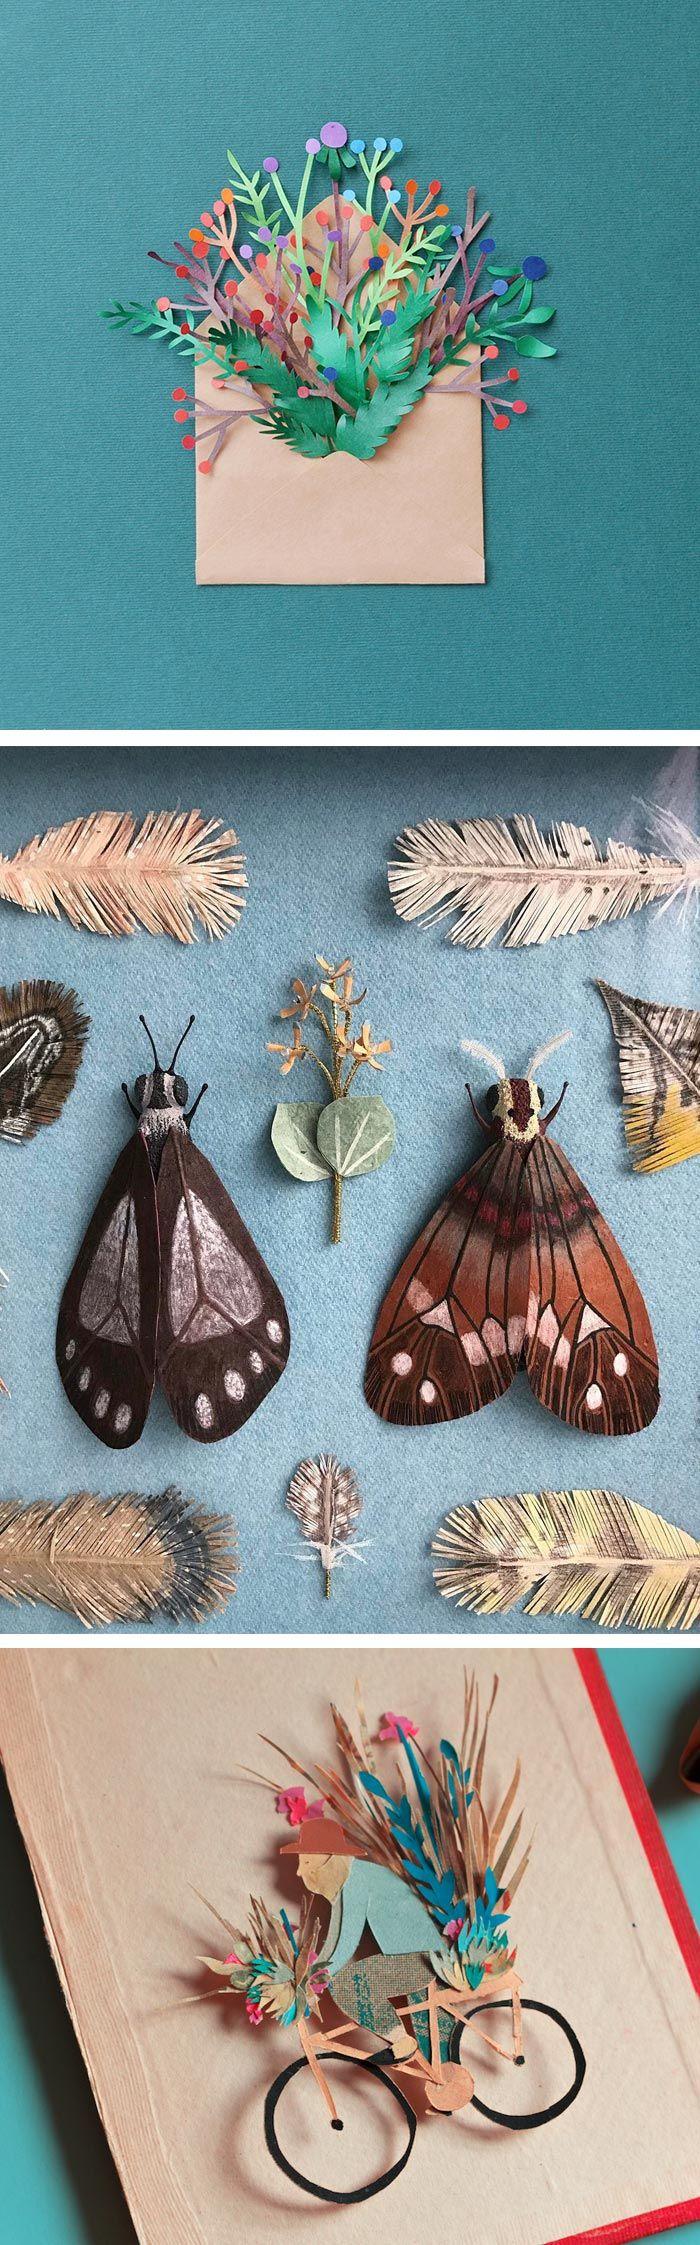 Paper illustrations // nature art // paper craft